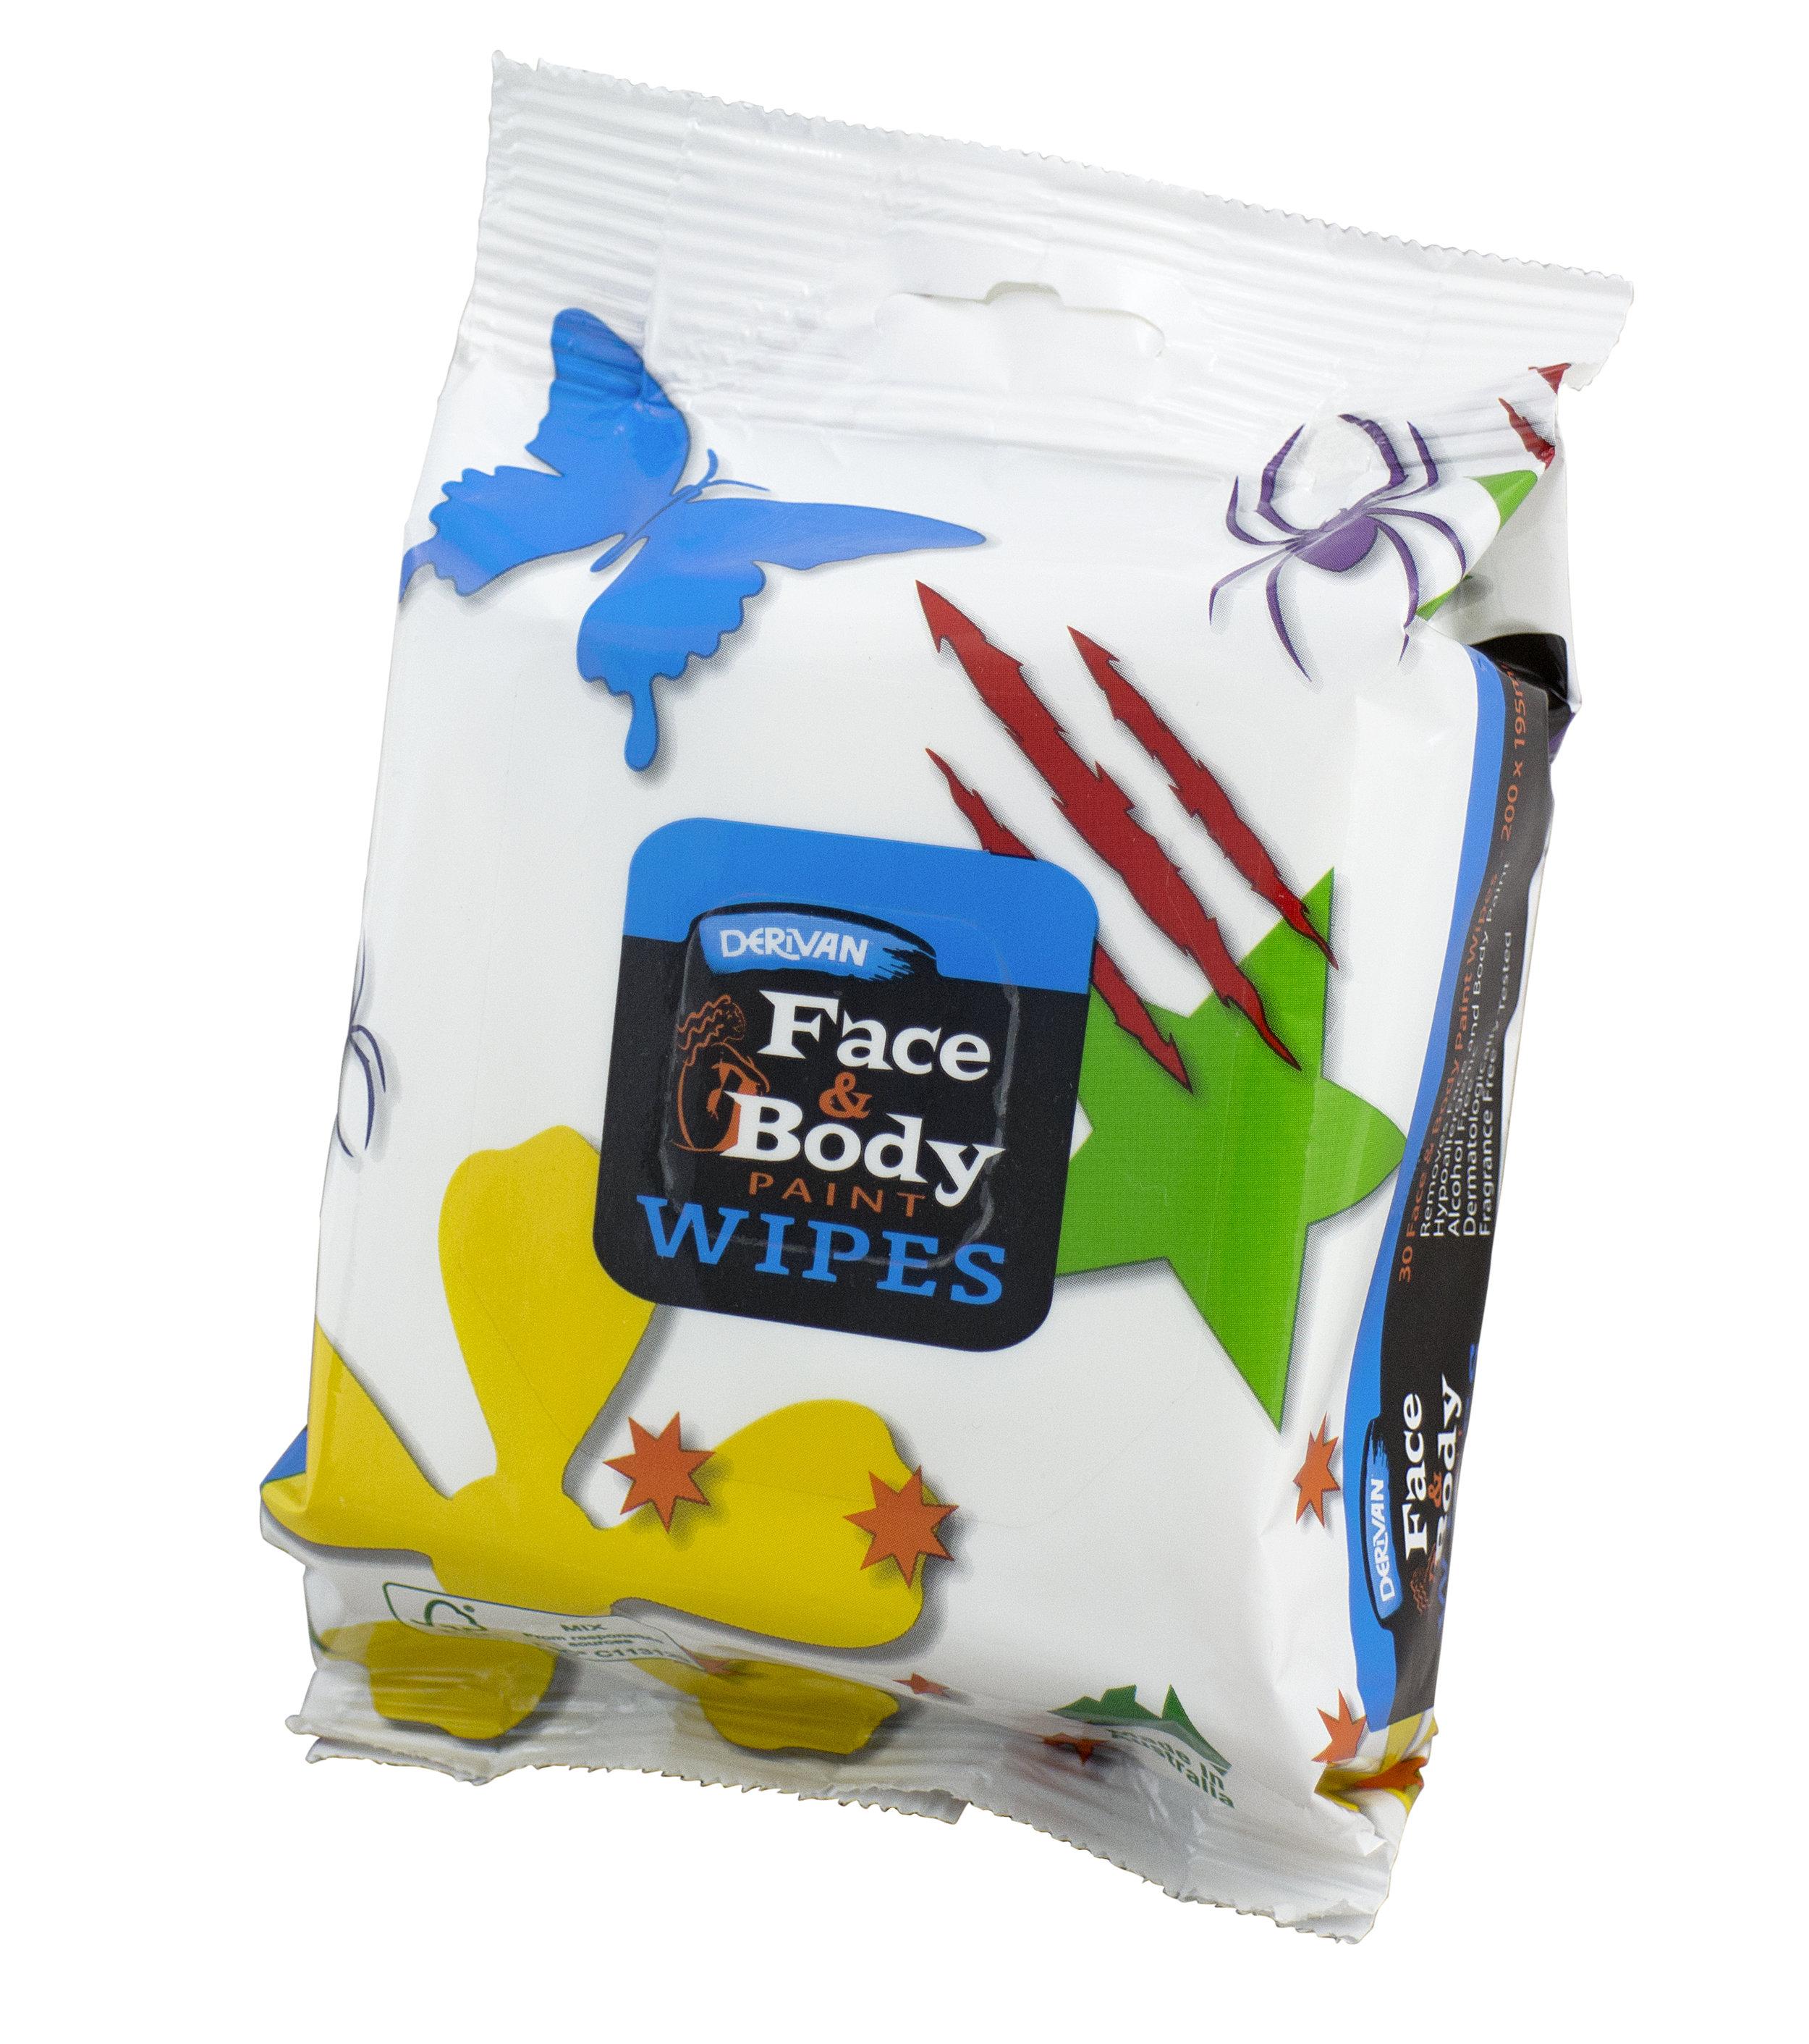 DERIVAN FACE & BODY WIPES